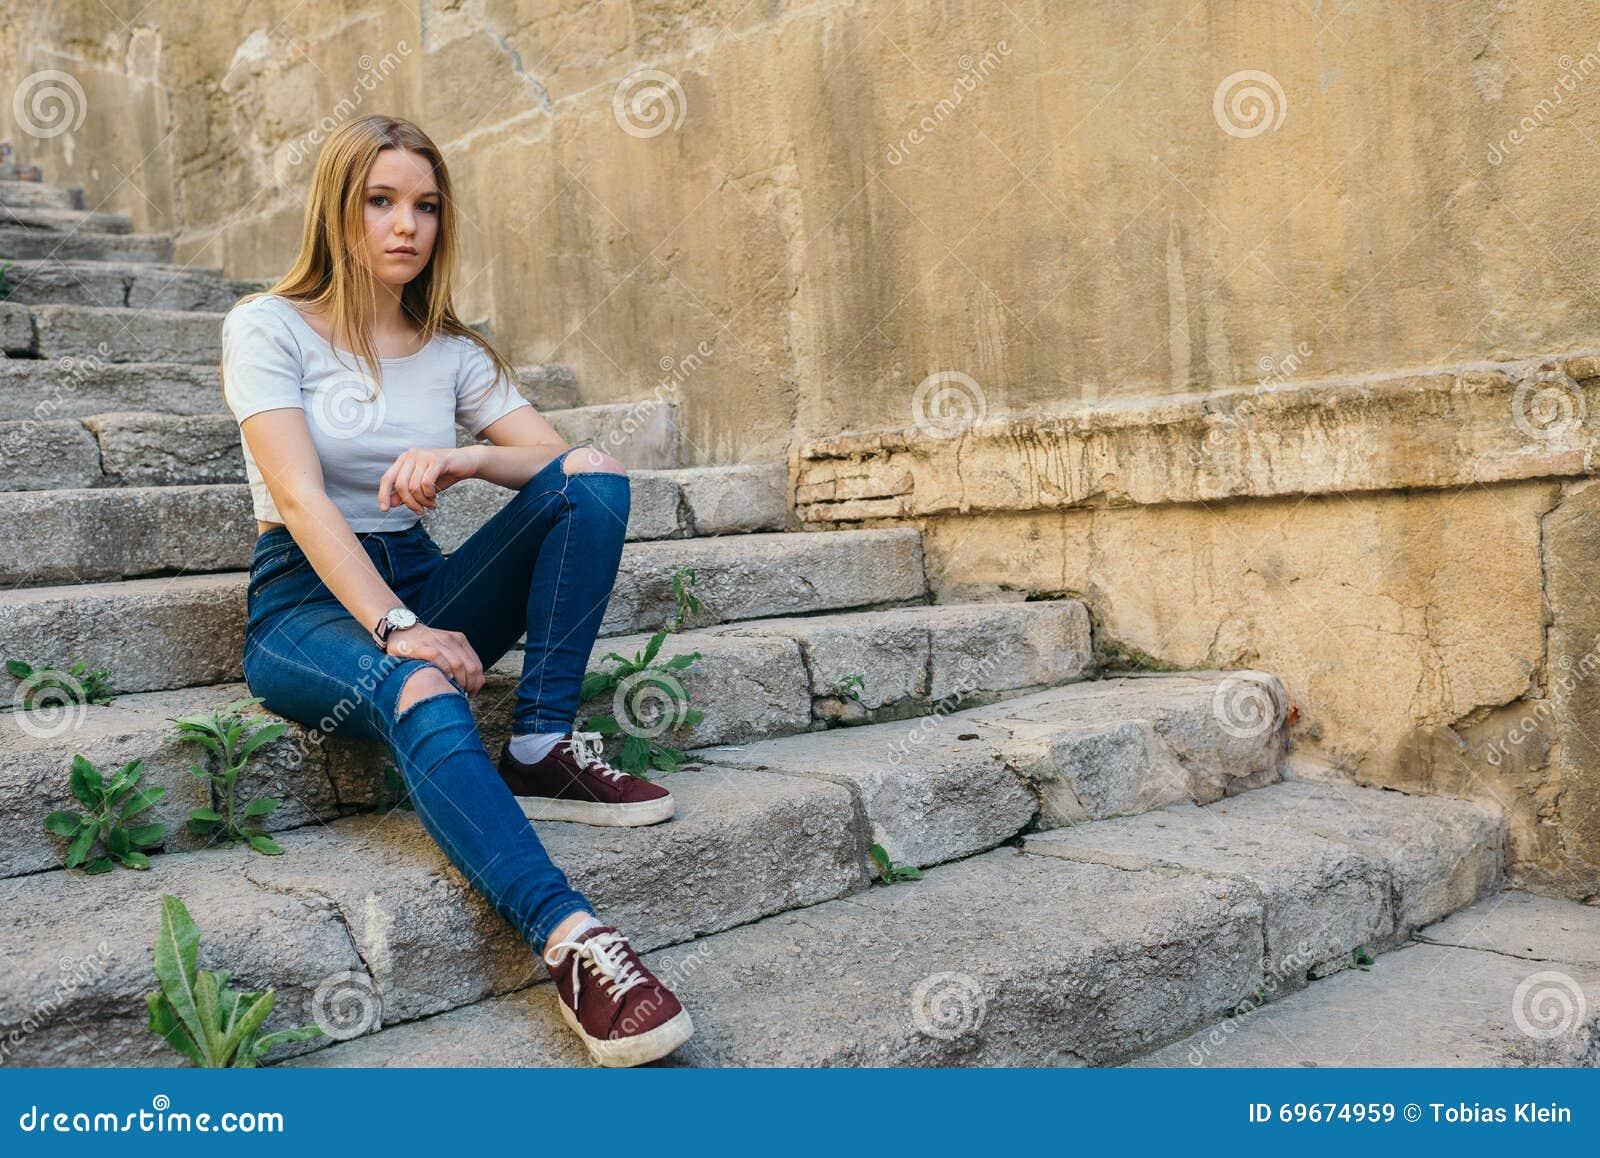 Adolescente con el carácter en Girona, España